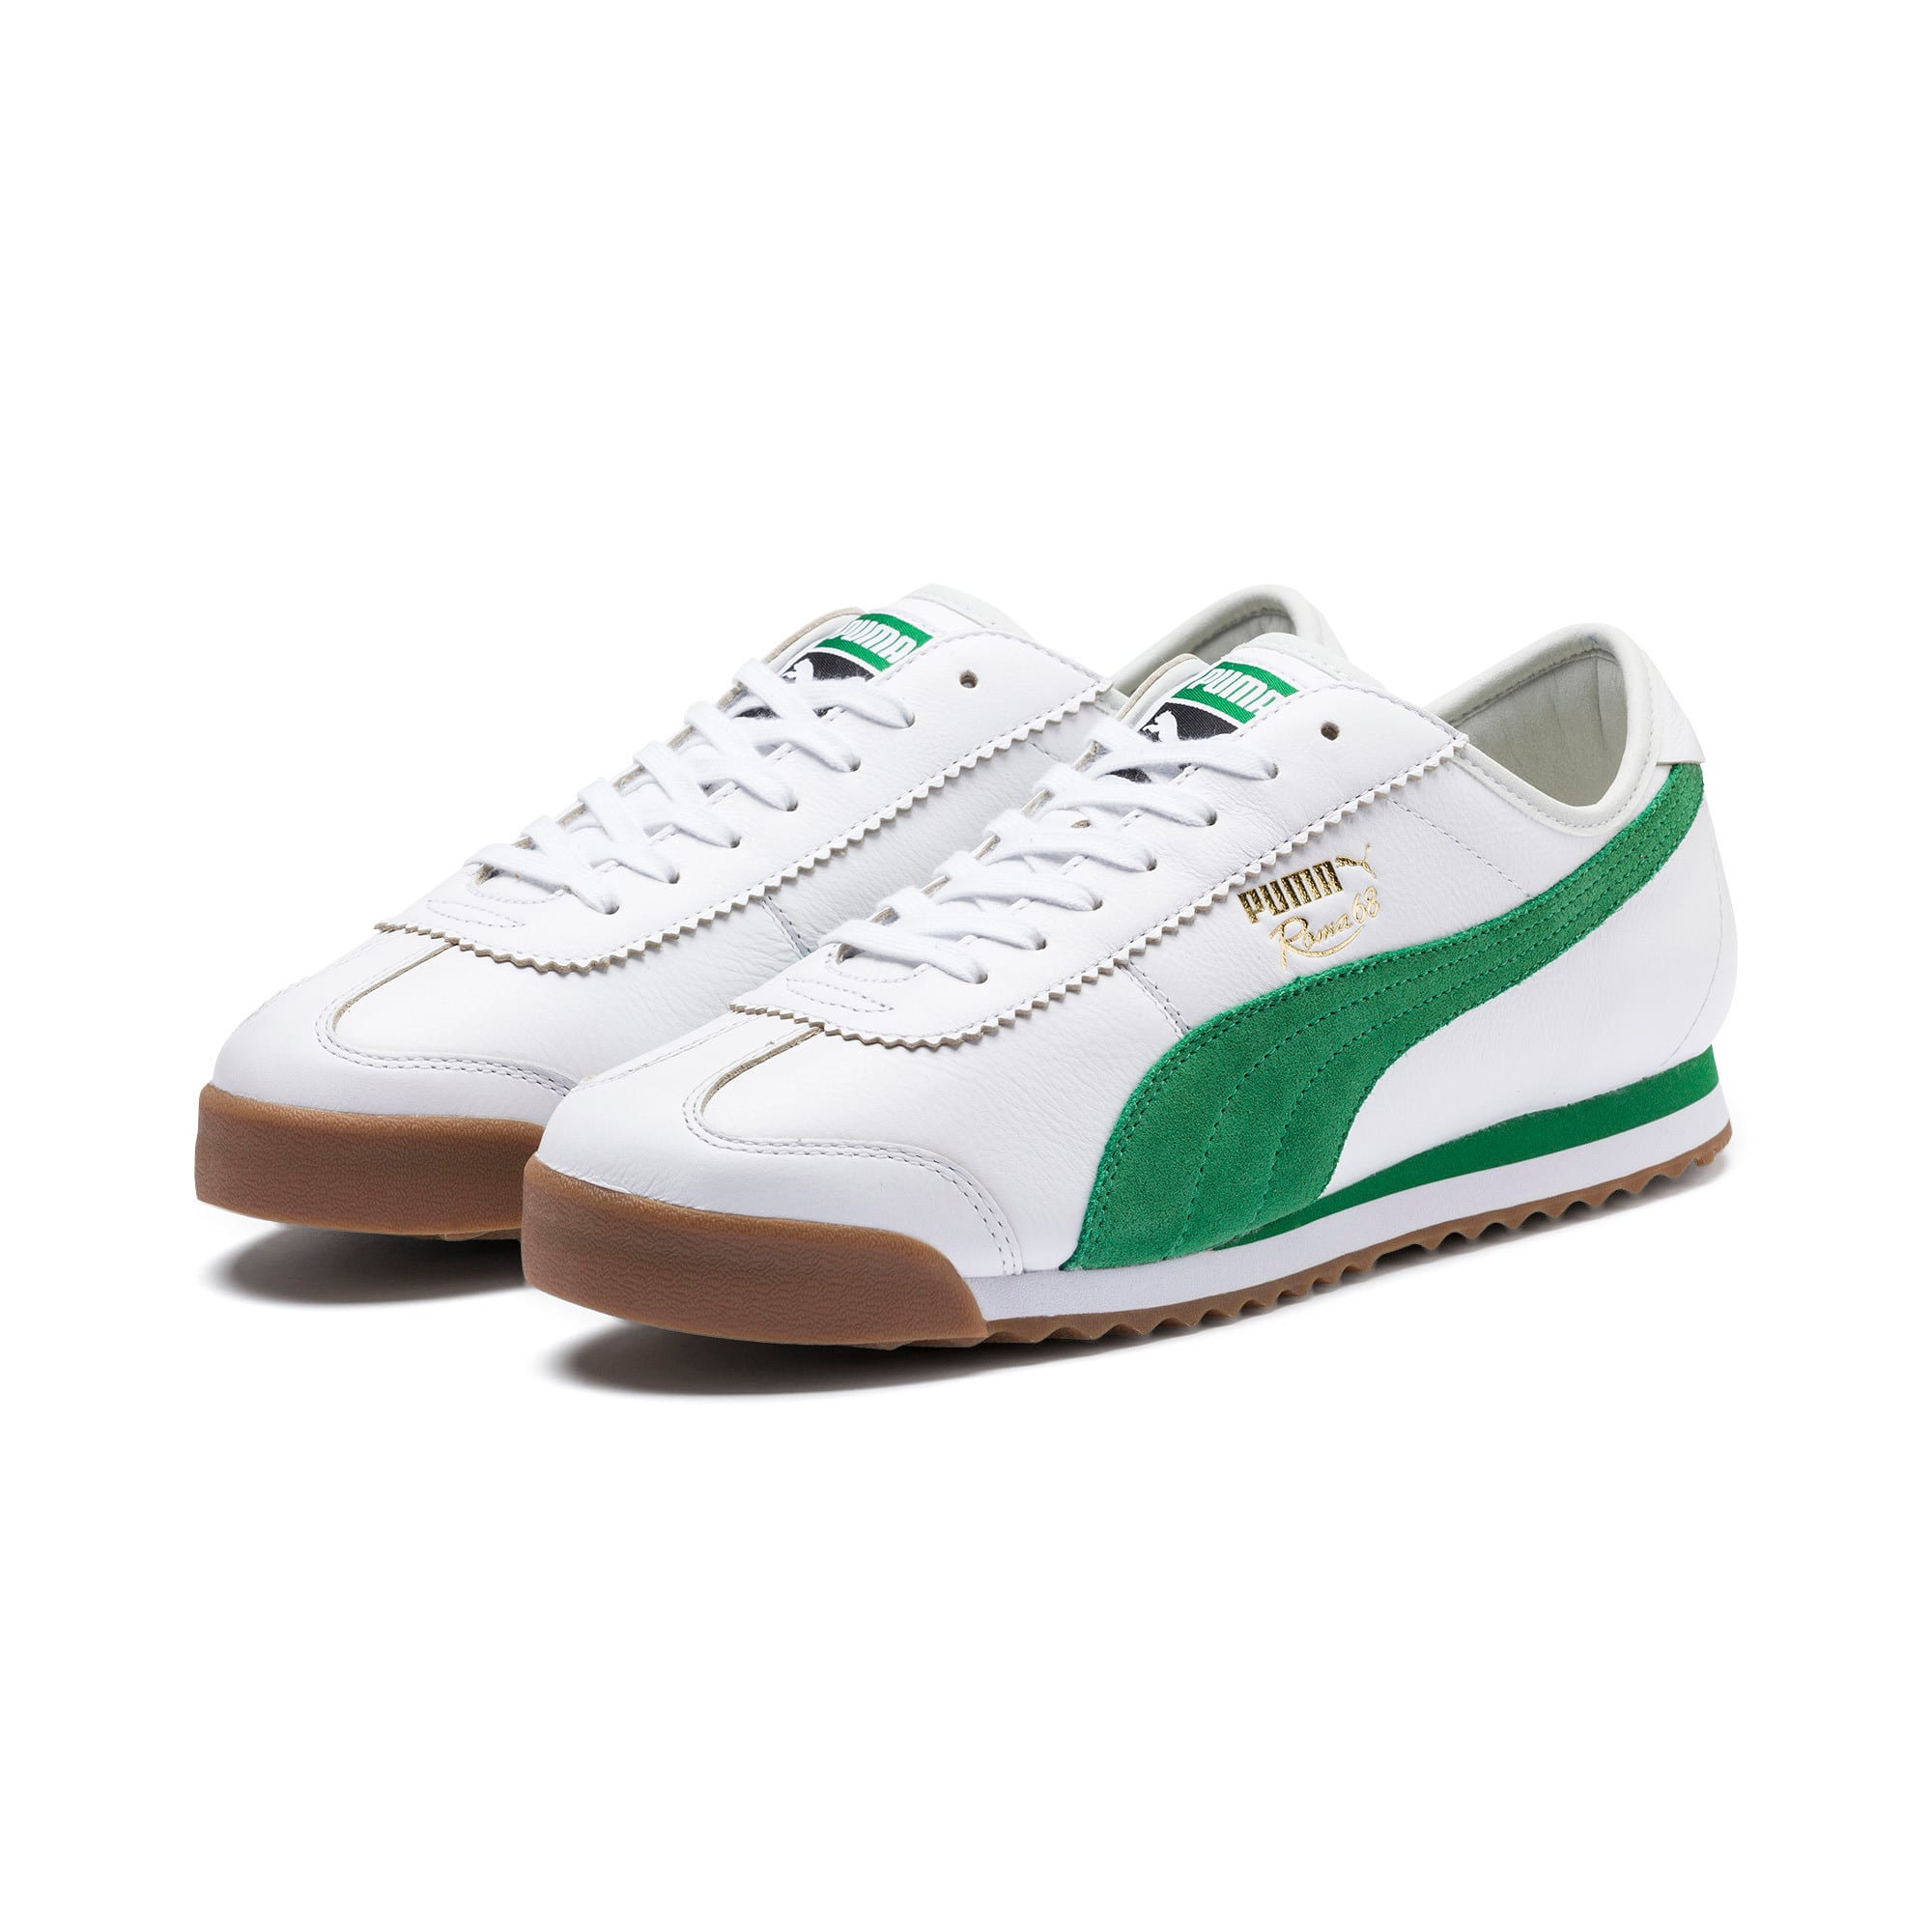 Thumbnail 3 of Roma '68 OG Sneakers, Puma White-Amazon Green, medium